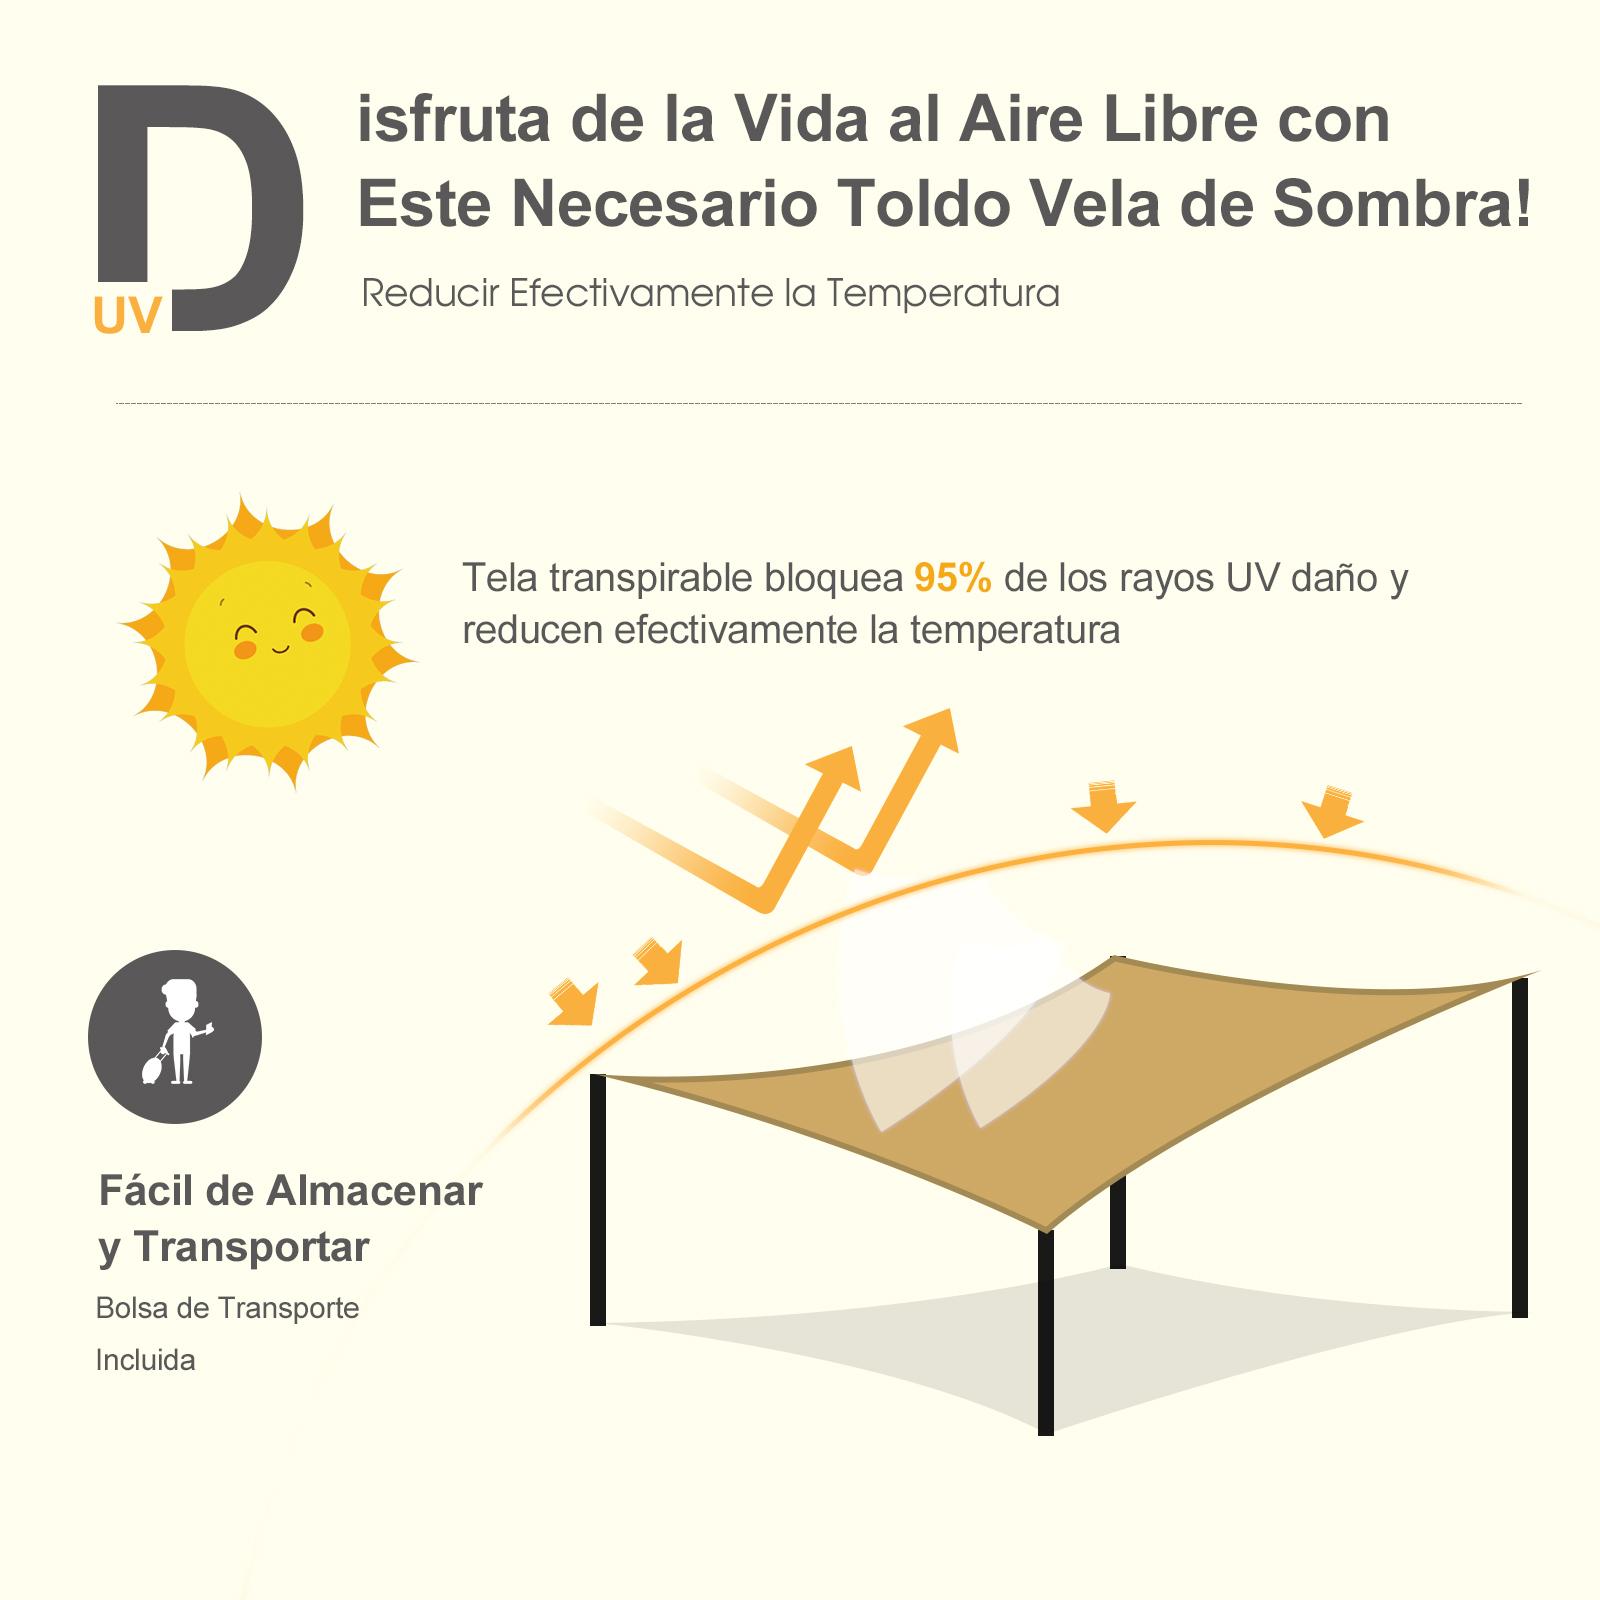 Toldo-de-Vela-Rectangular-para-Jardin-y-Exterior-Repelente-al-Agua-Proteccion-UV miniatura 4